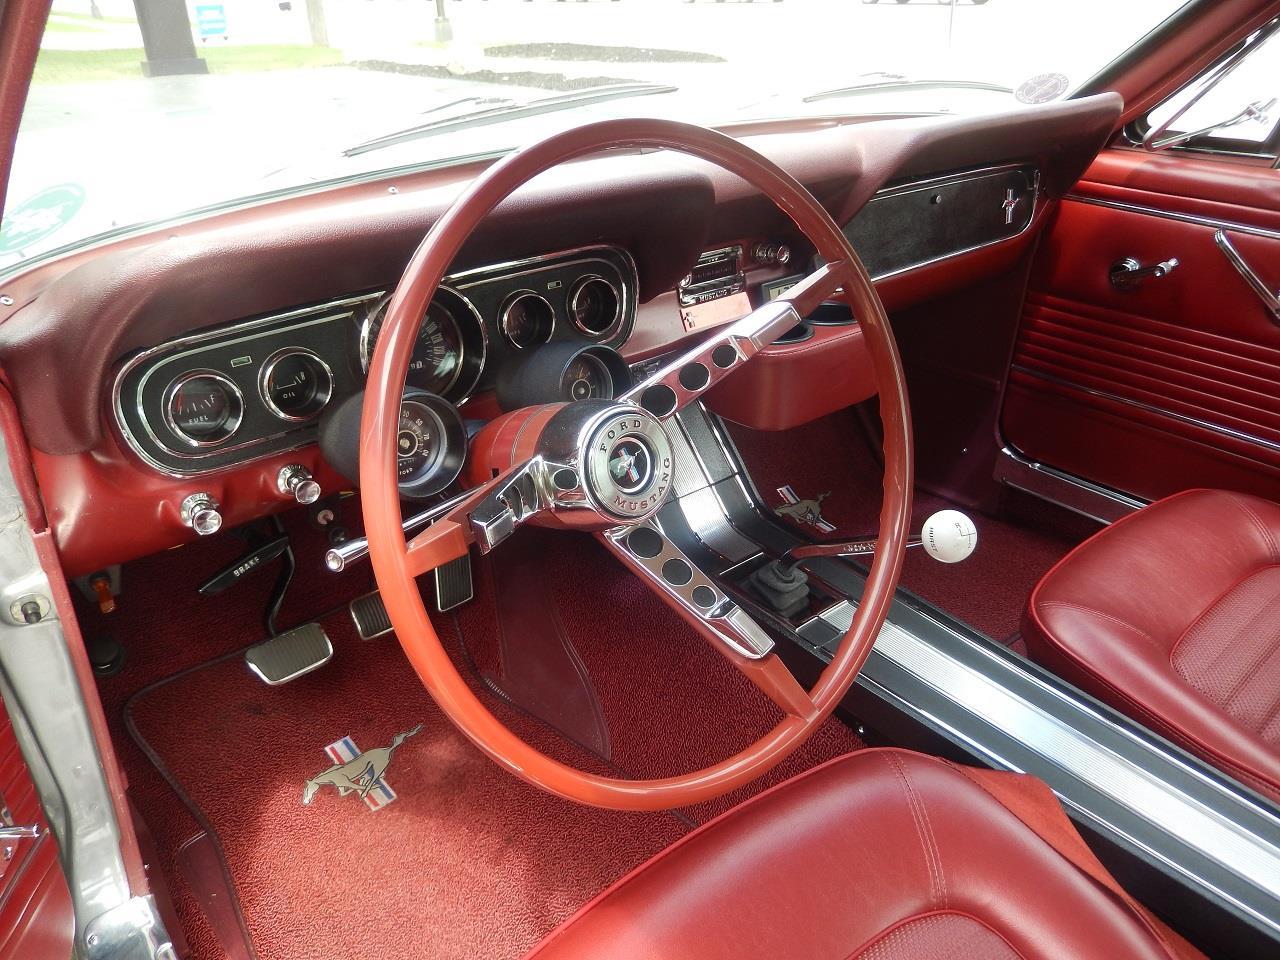 Ford Mustang Fastback v8 1966 prix tout compris